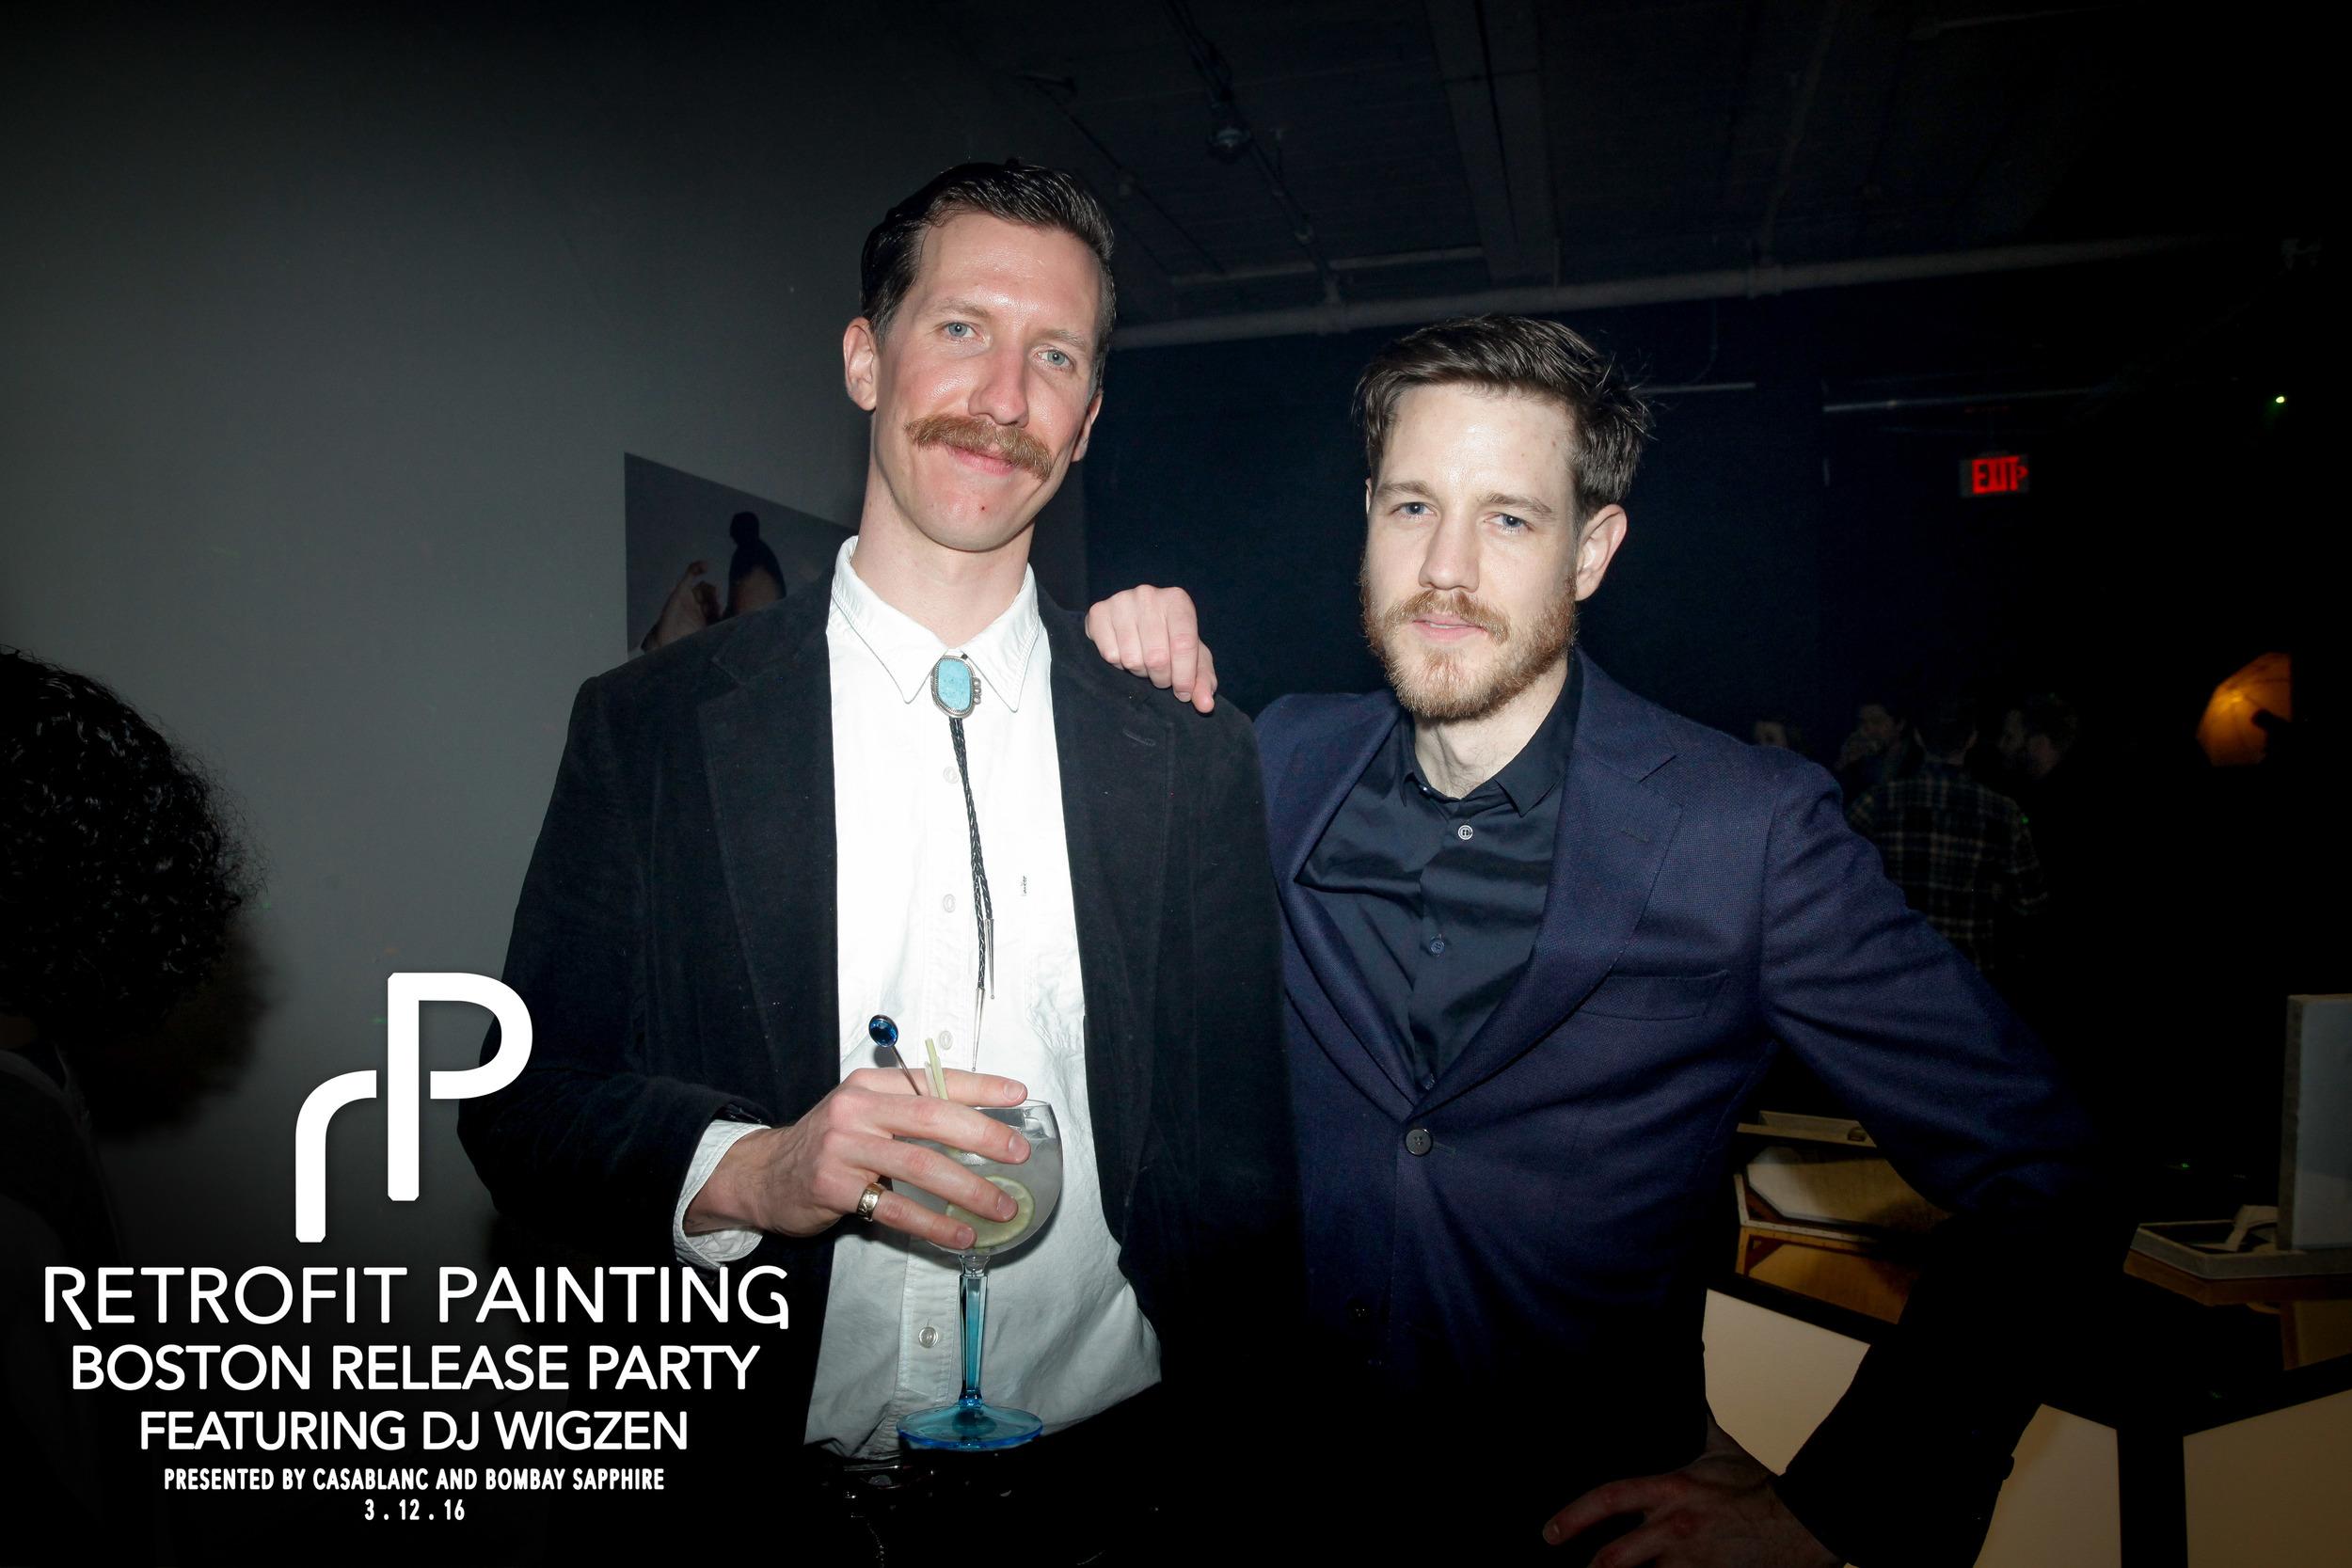 Retrofit Painting Boston Release Party 0022.jpg